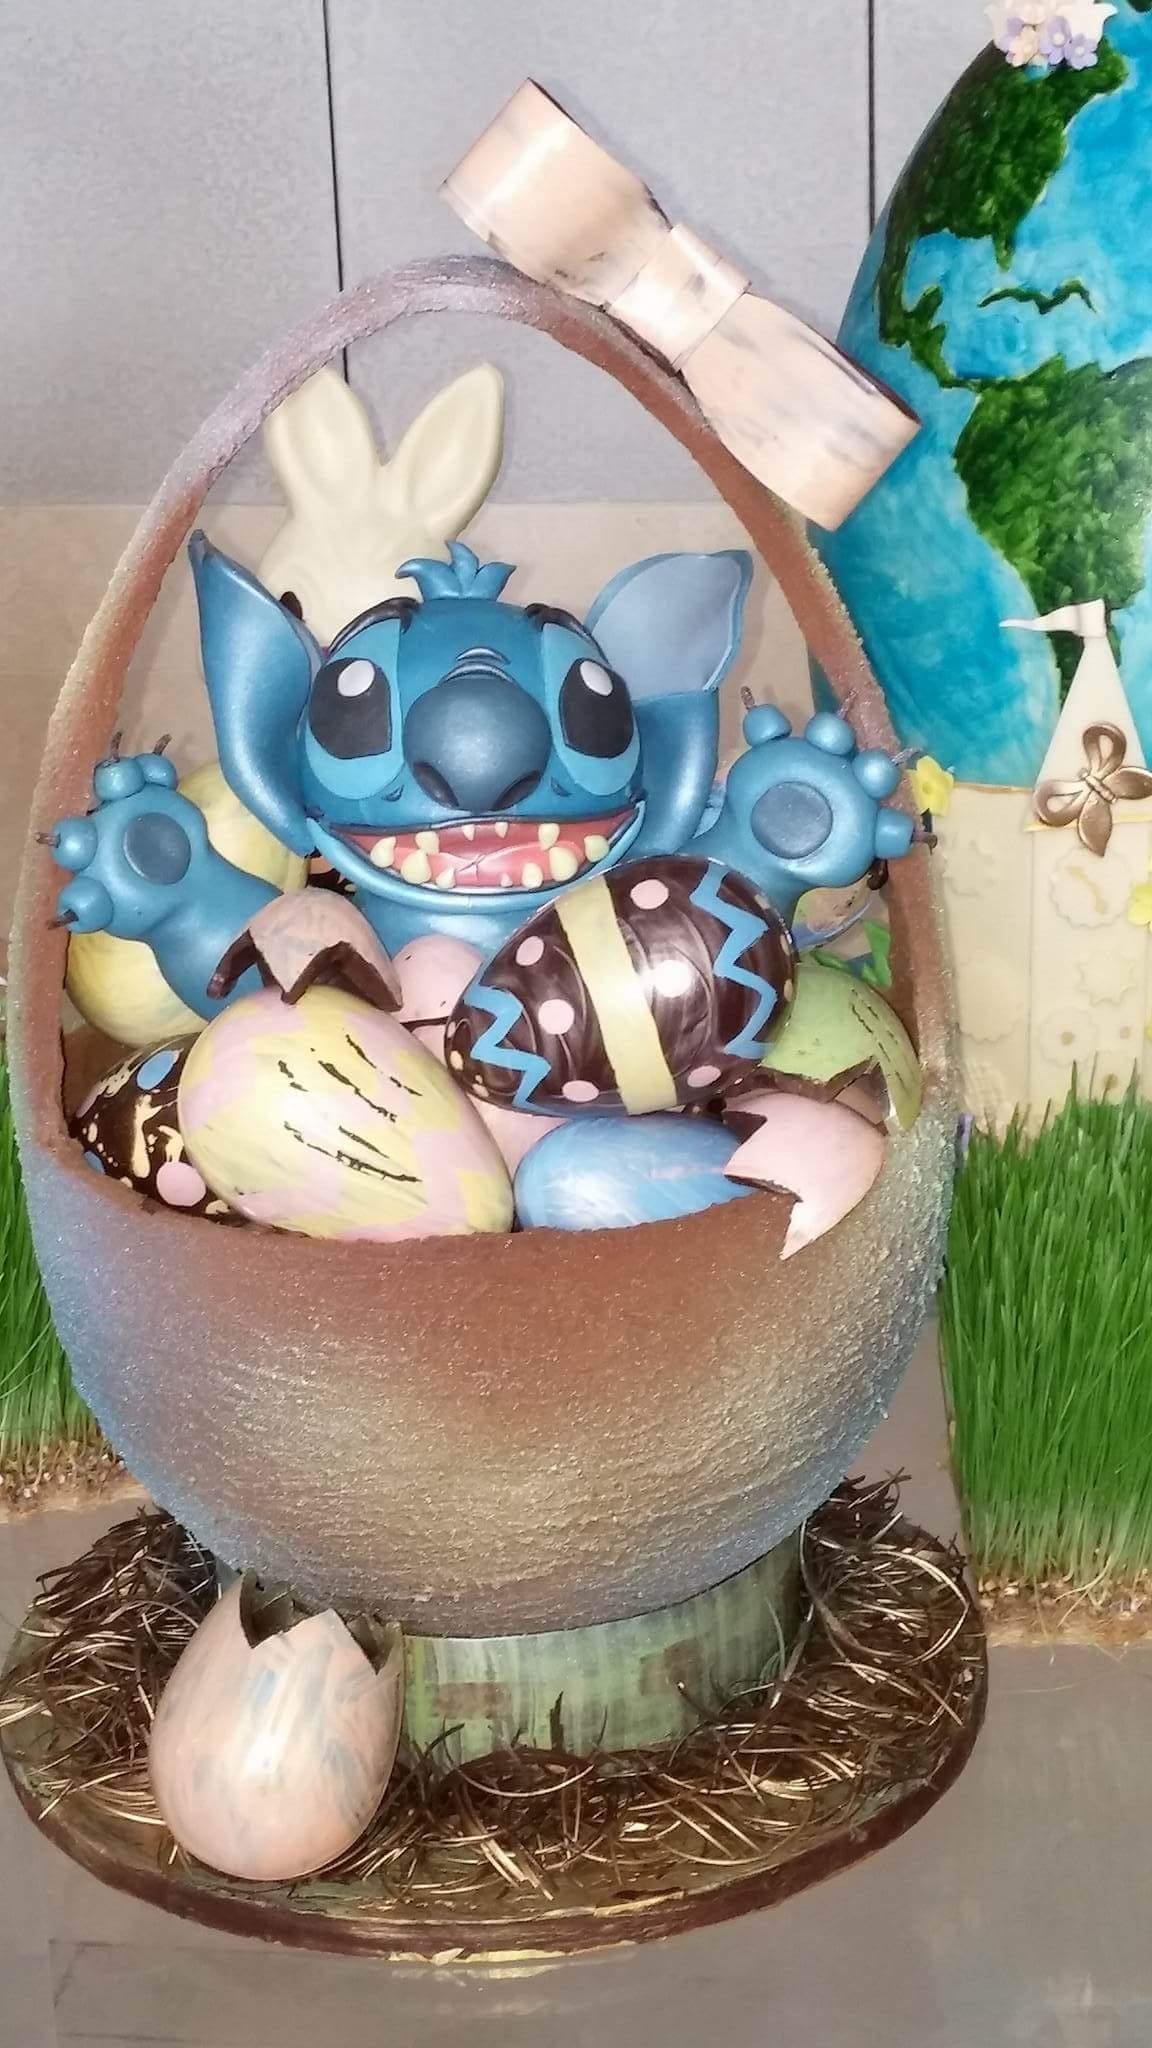 Happy Easter From Walt Disney World!